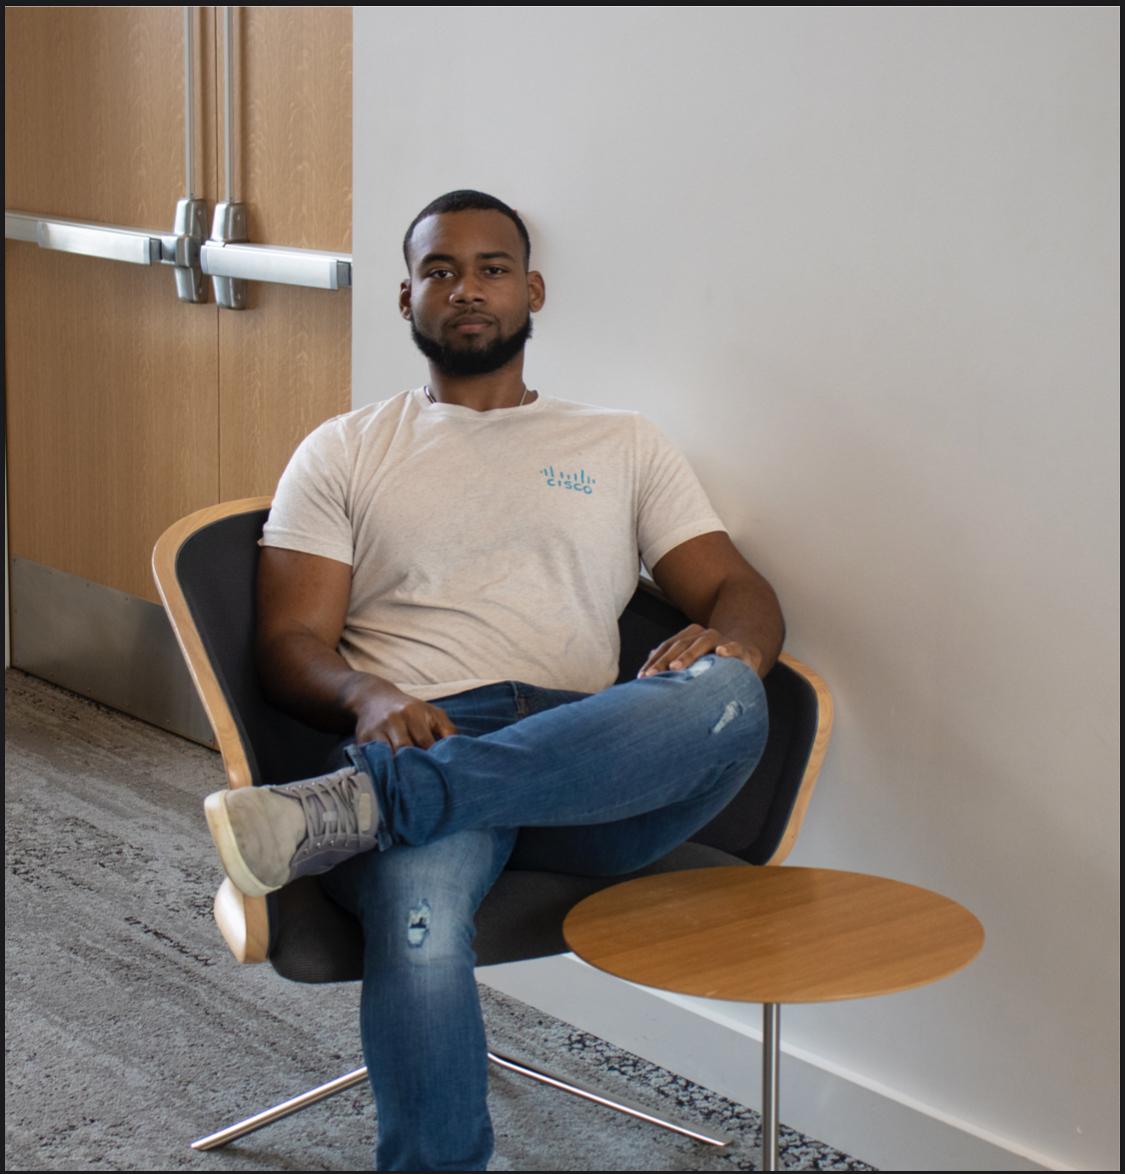 Michael sitting in chair wearing Cisco shirt.